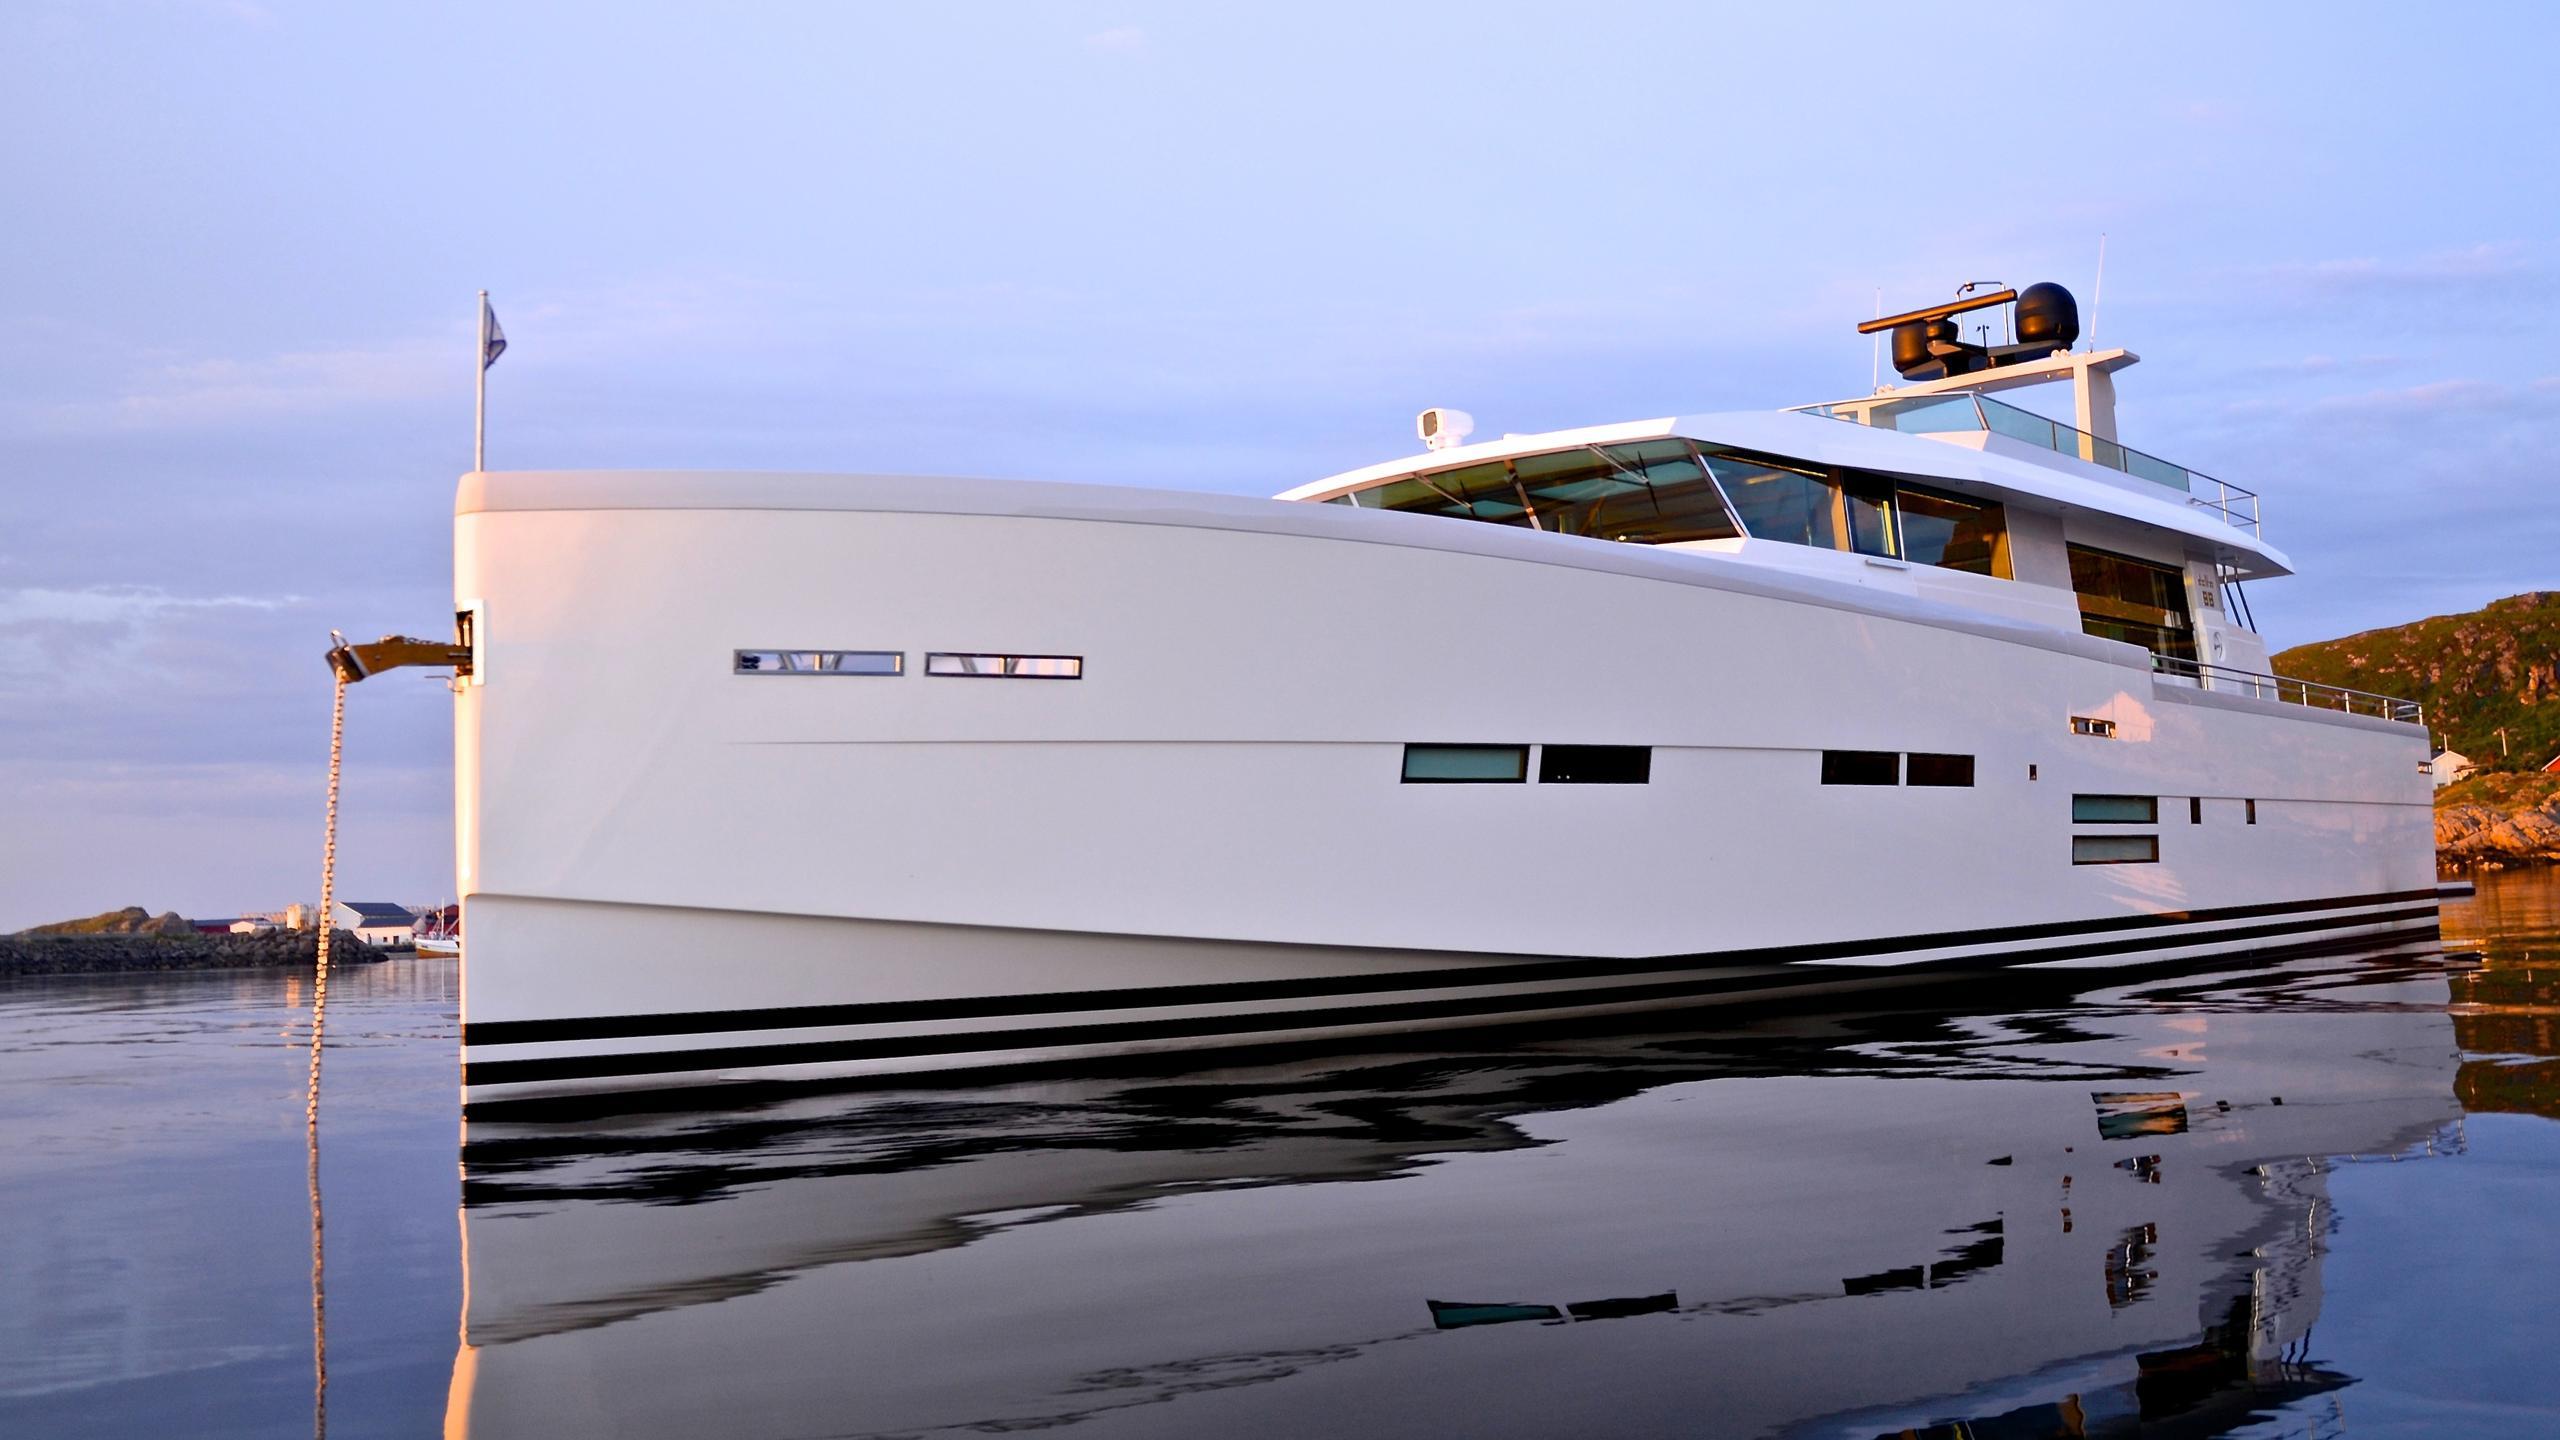 Delta carbon 88 yacht at anchor